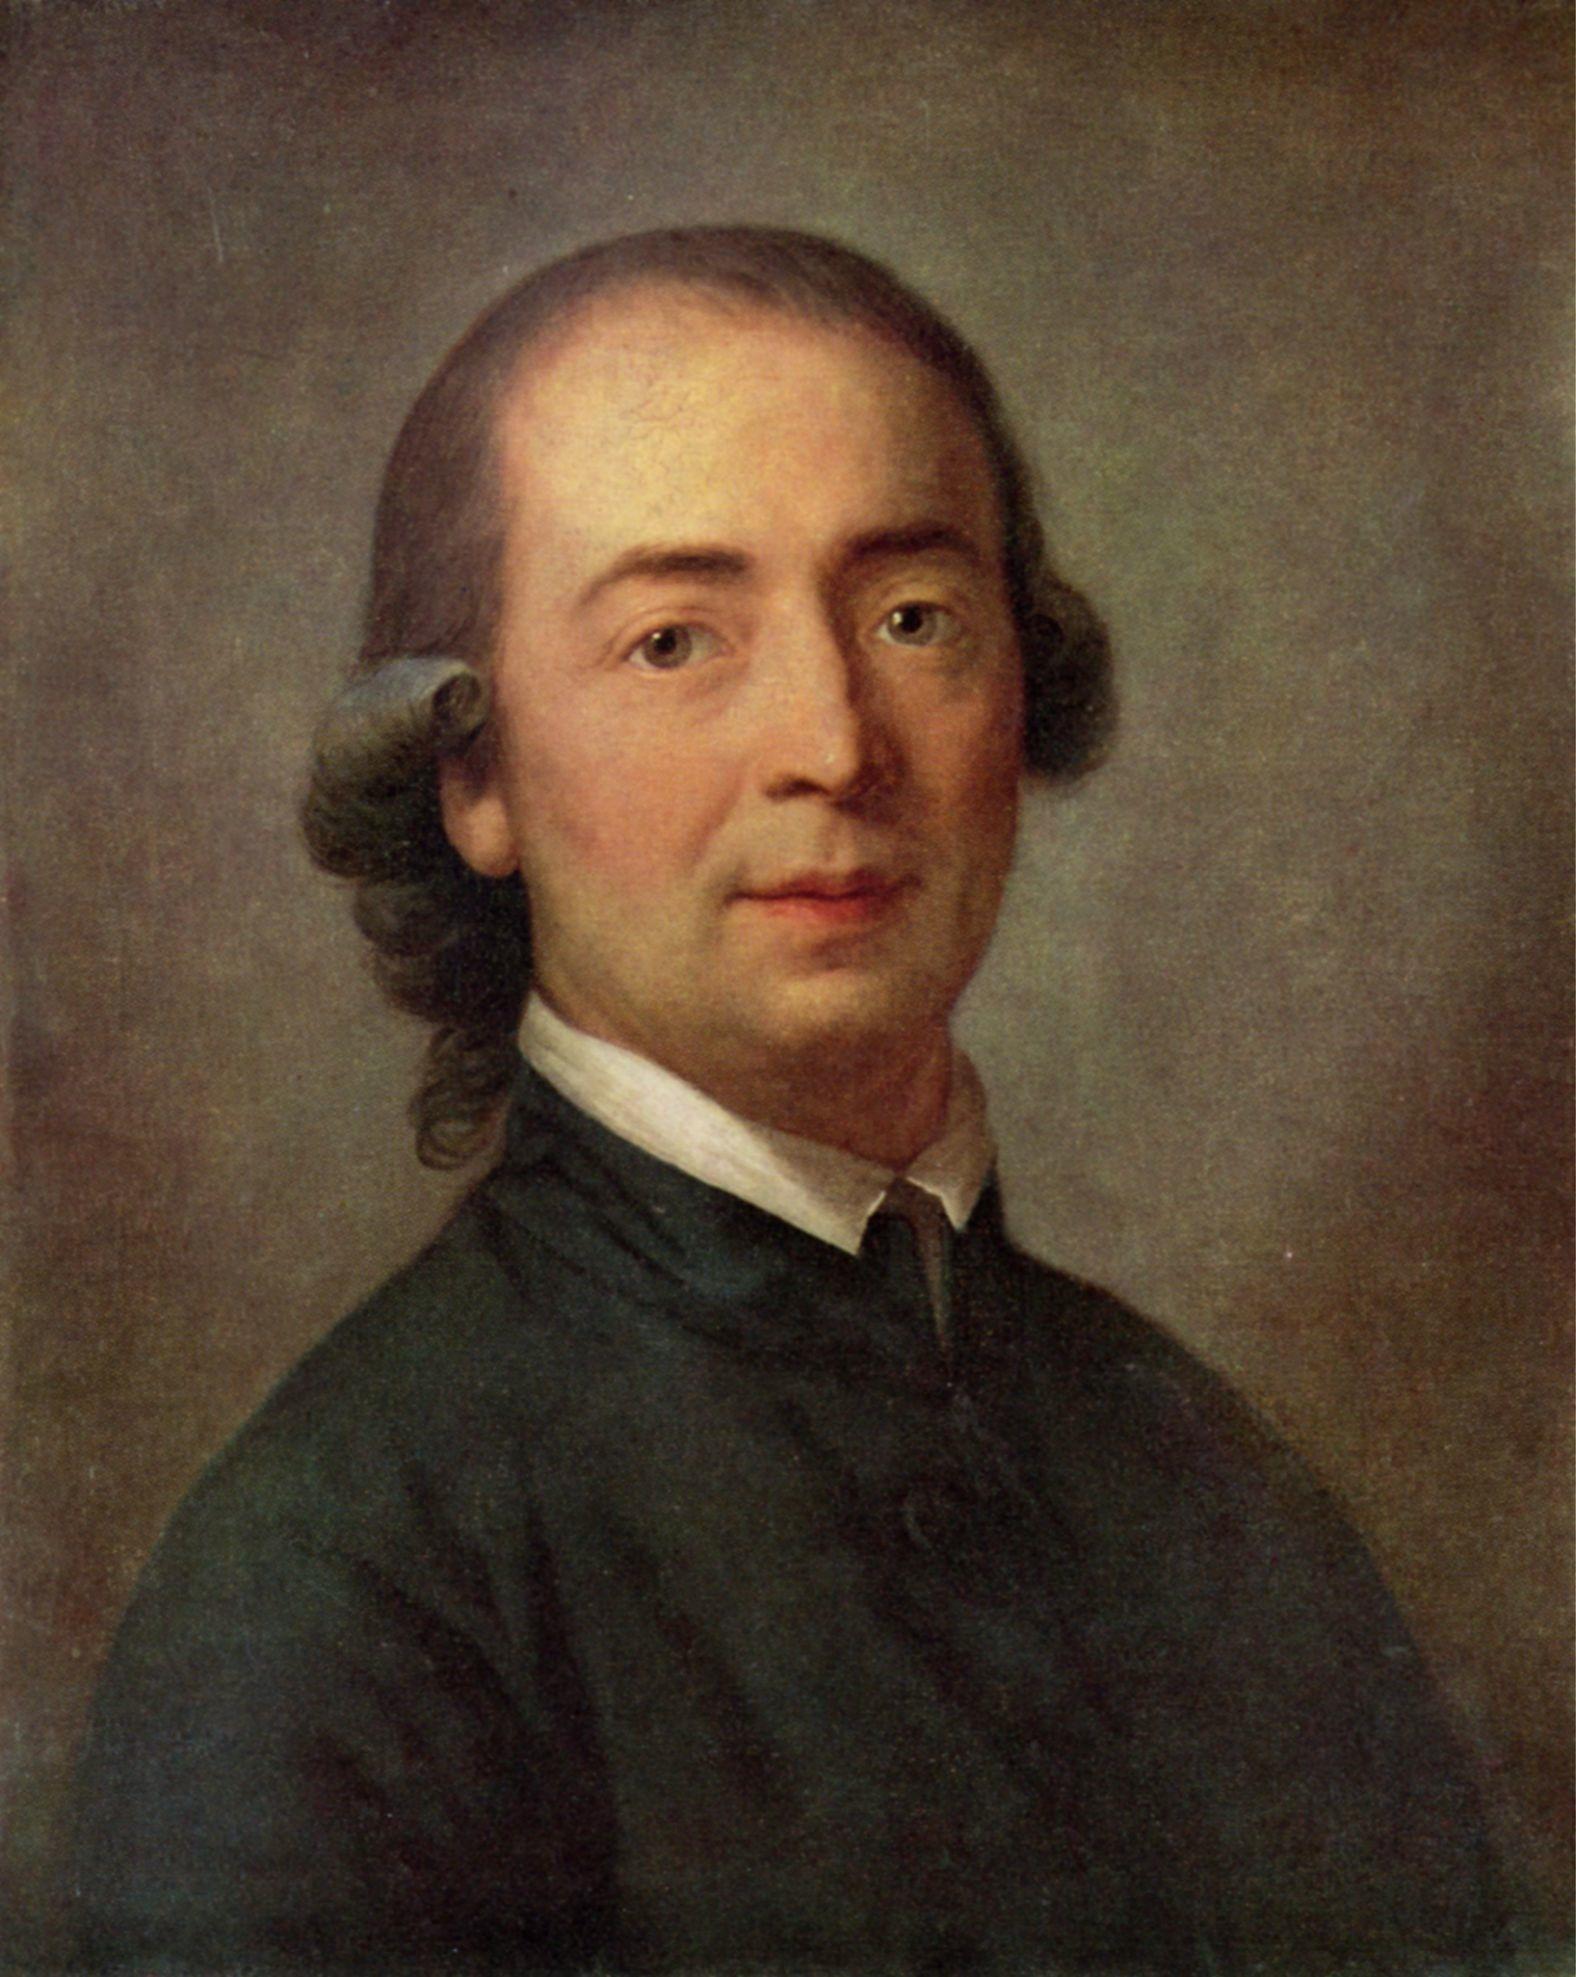 Herder by [[Anton Graff]], 1785